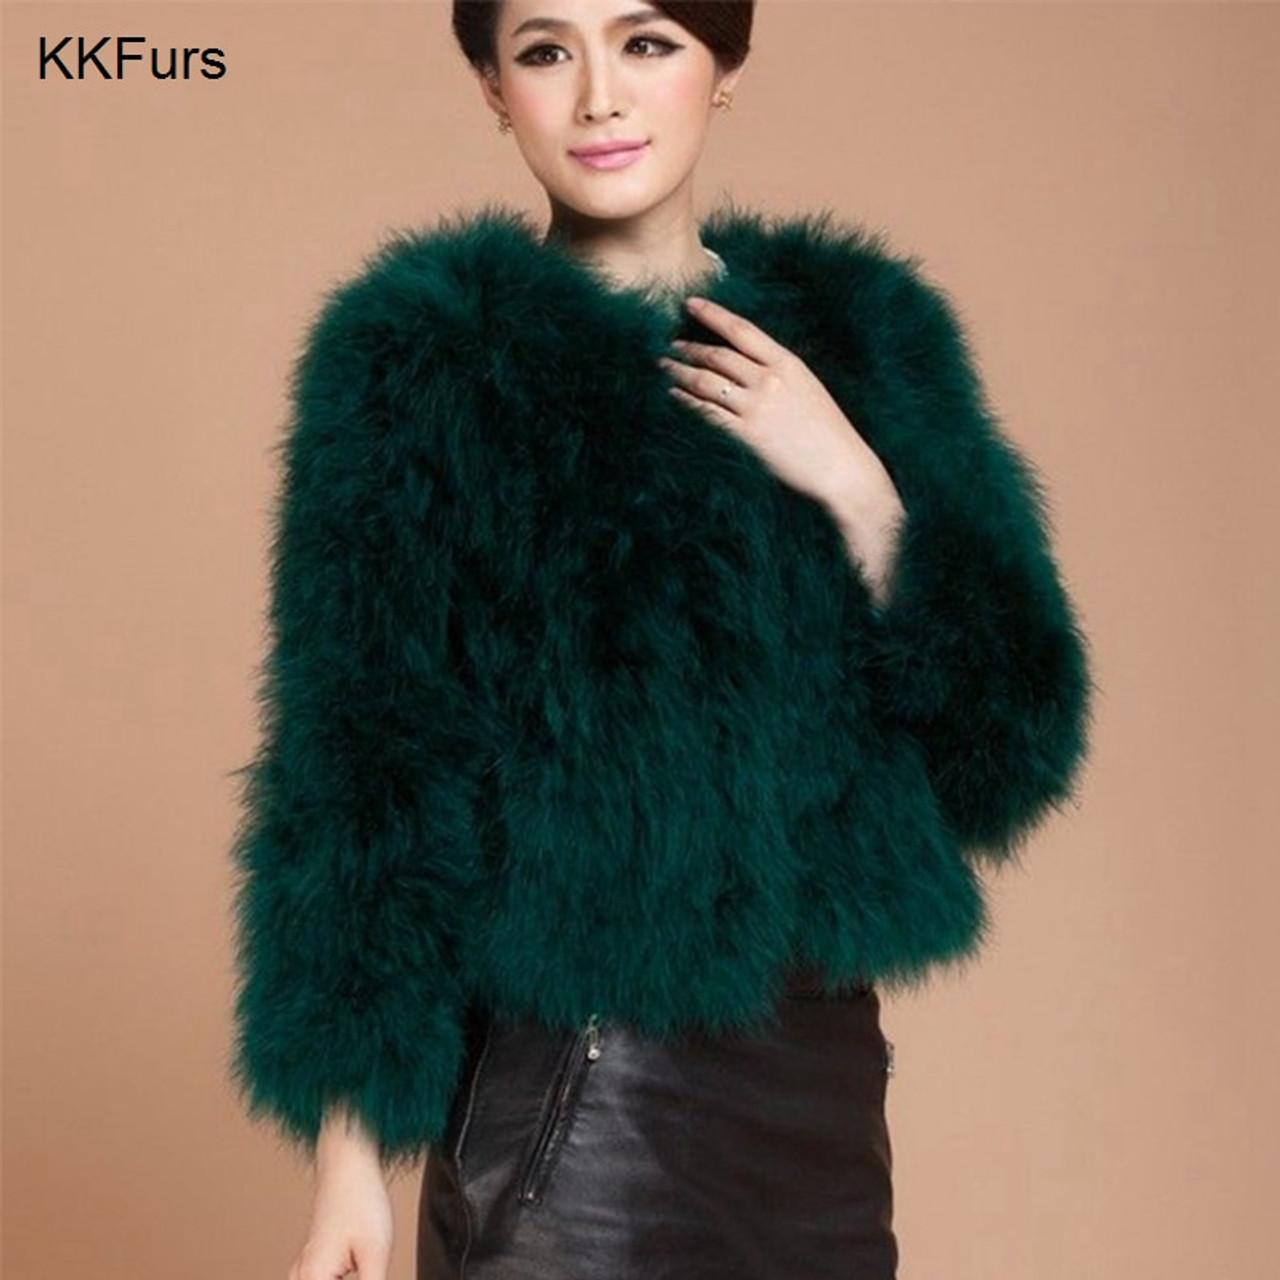 7fe0b5beb23 ... JKKFURS 2018 New Women Coat Real Ostrich Feather Top Quality AA Lady  Genuine Turkey Fur Jacket ...